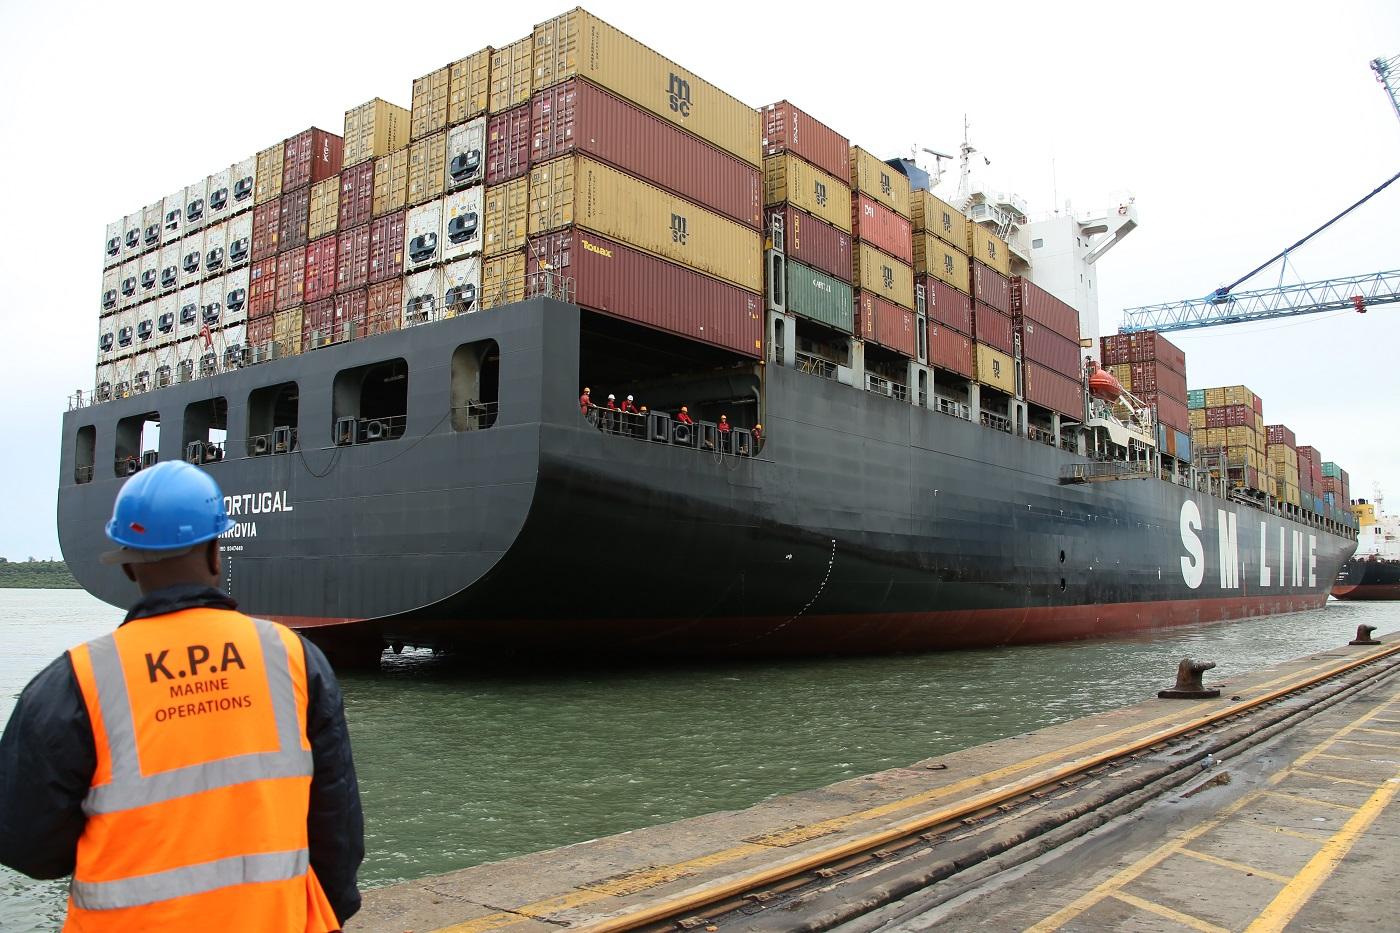 Mombasa Port Container Depot www.businesstoday.co.ke